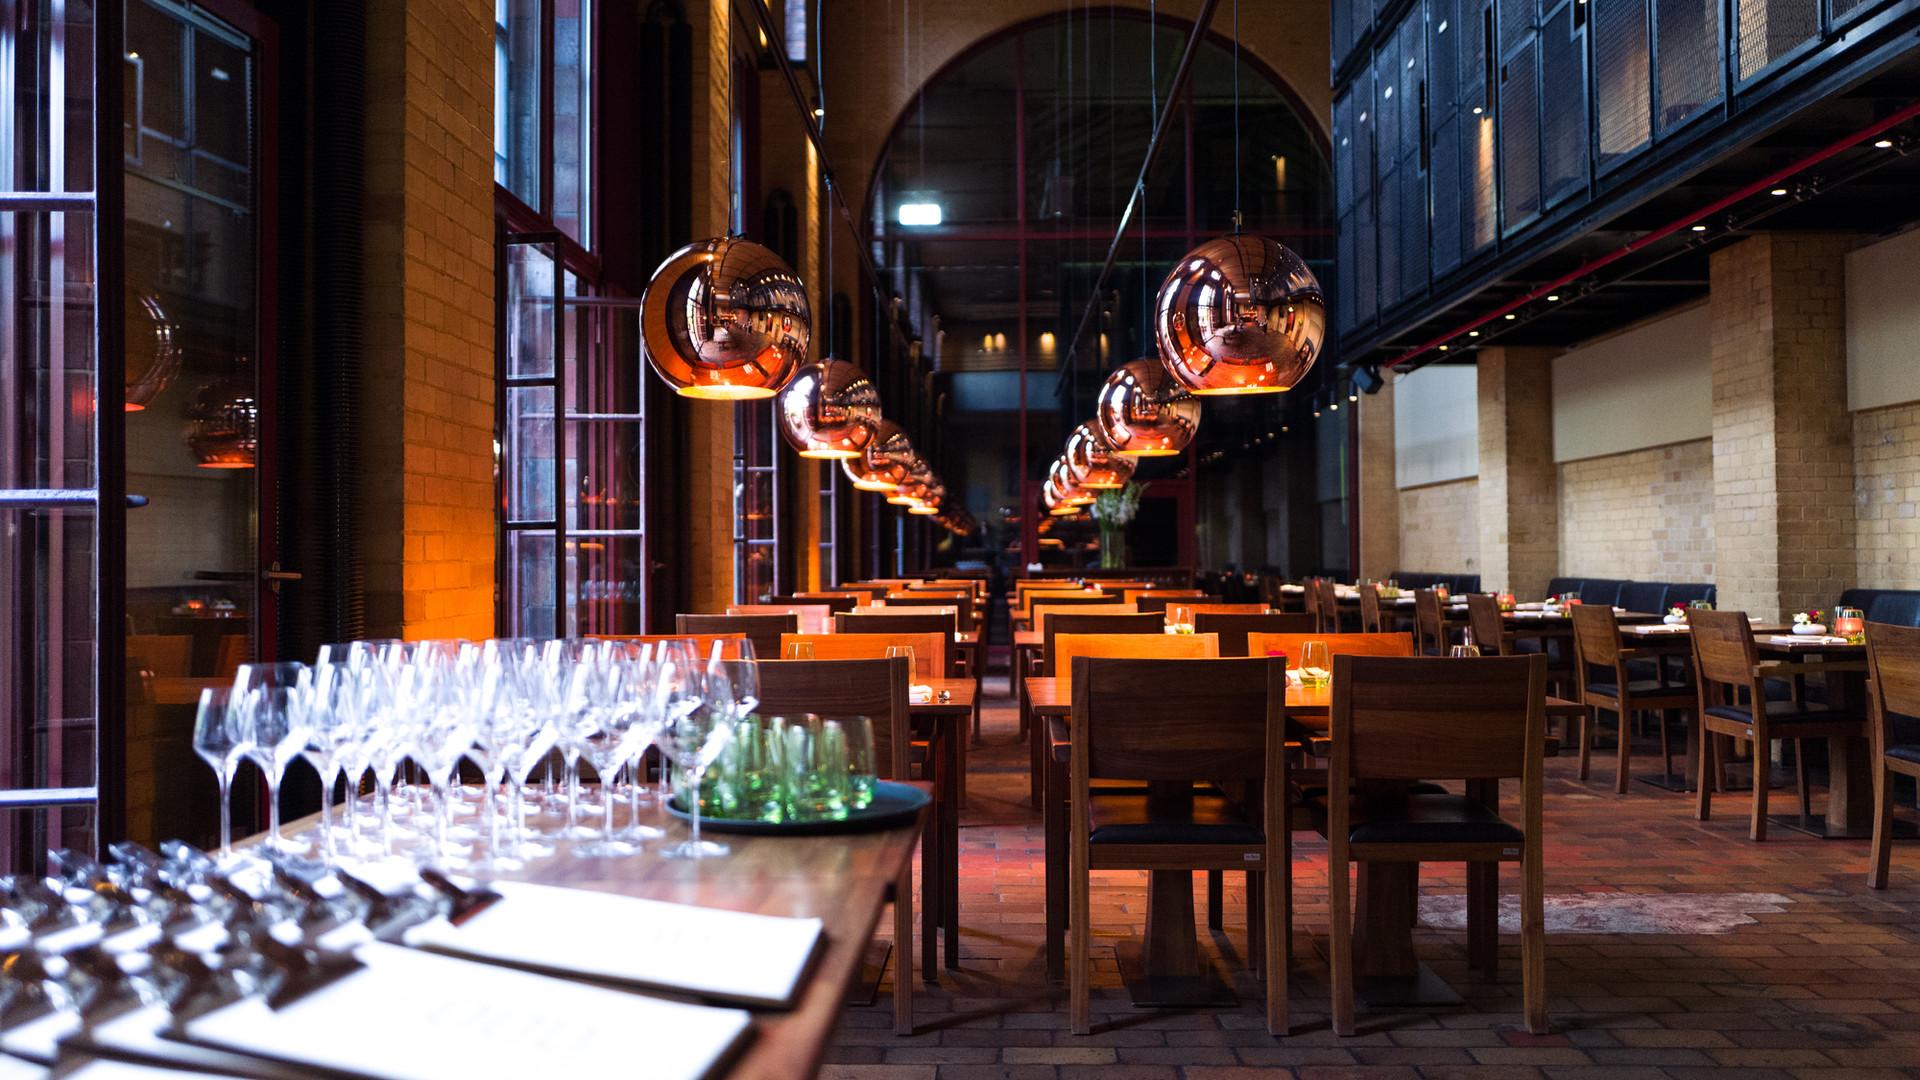 Borkeberlin, Volt Restaurant Berlin Commercial